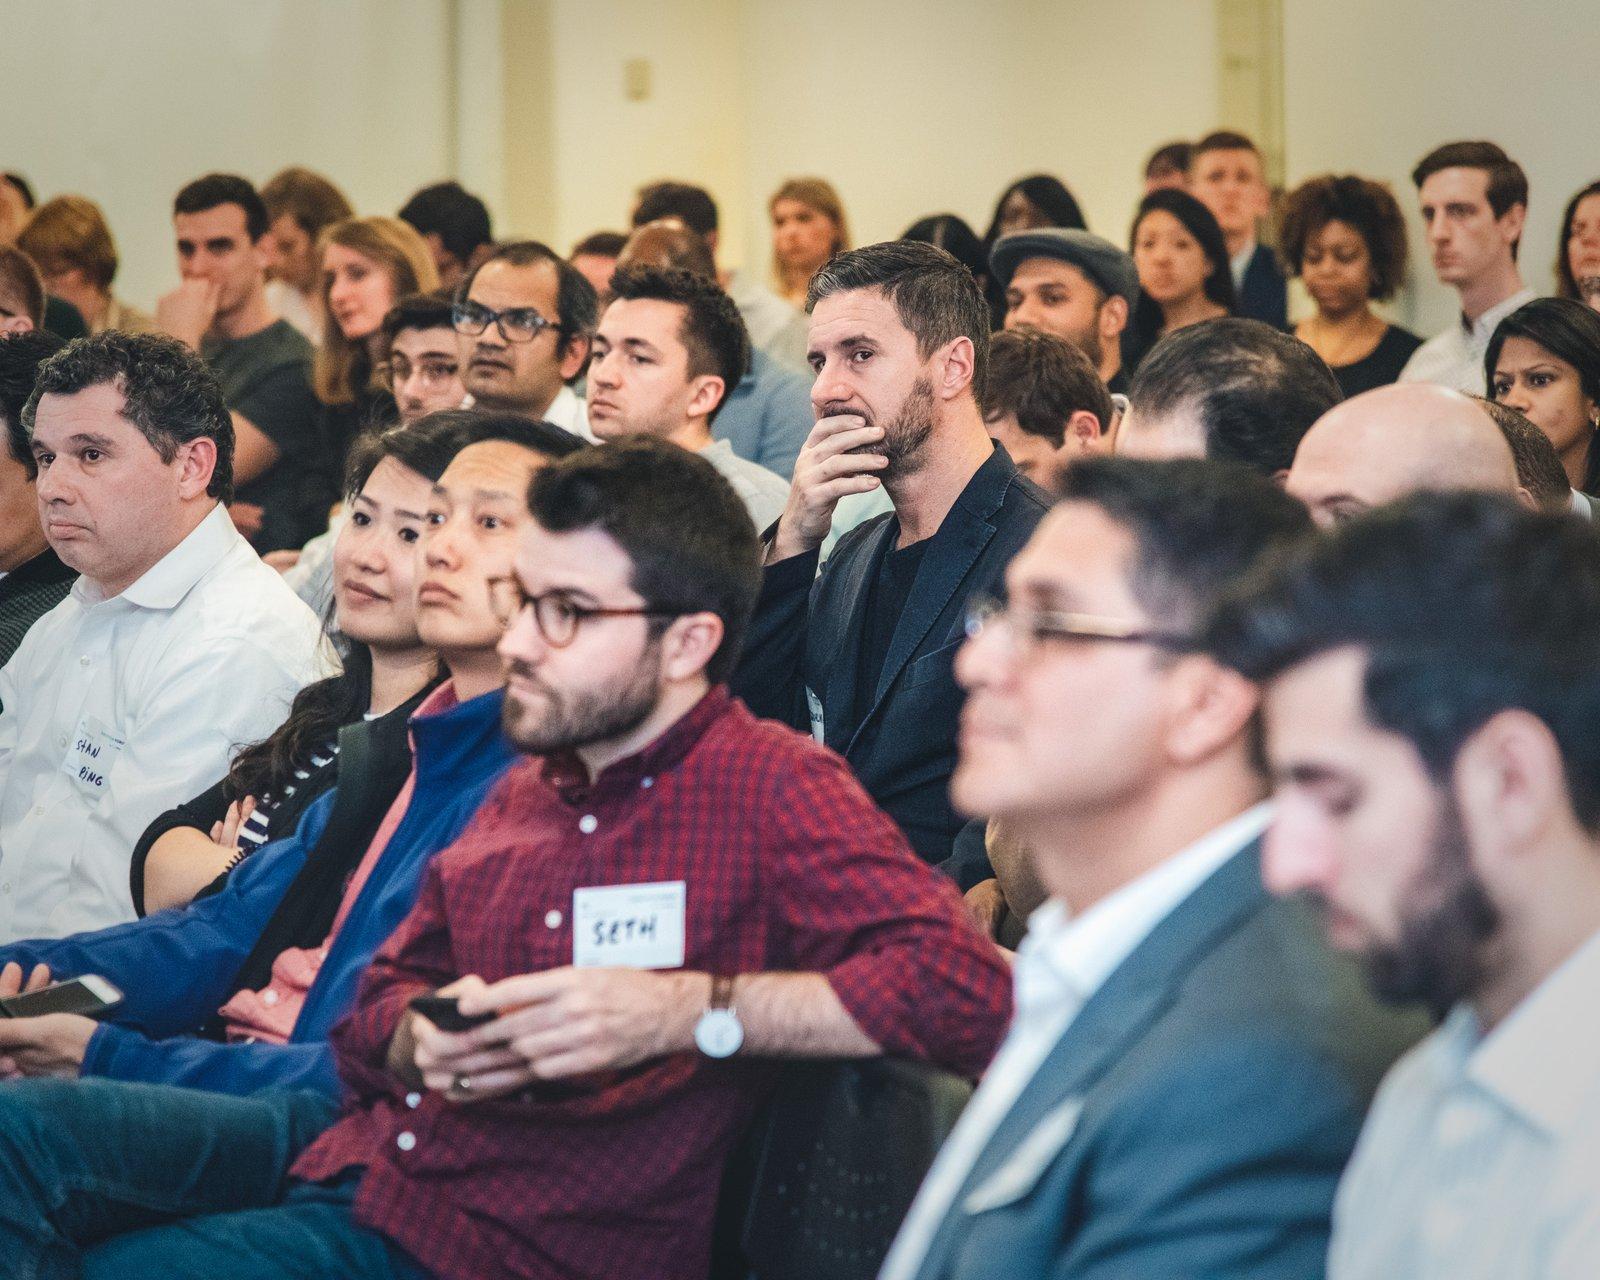 disruption forum on innovations netguru